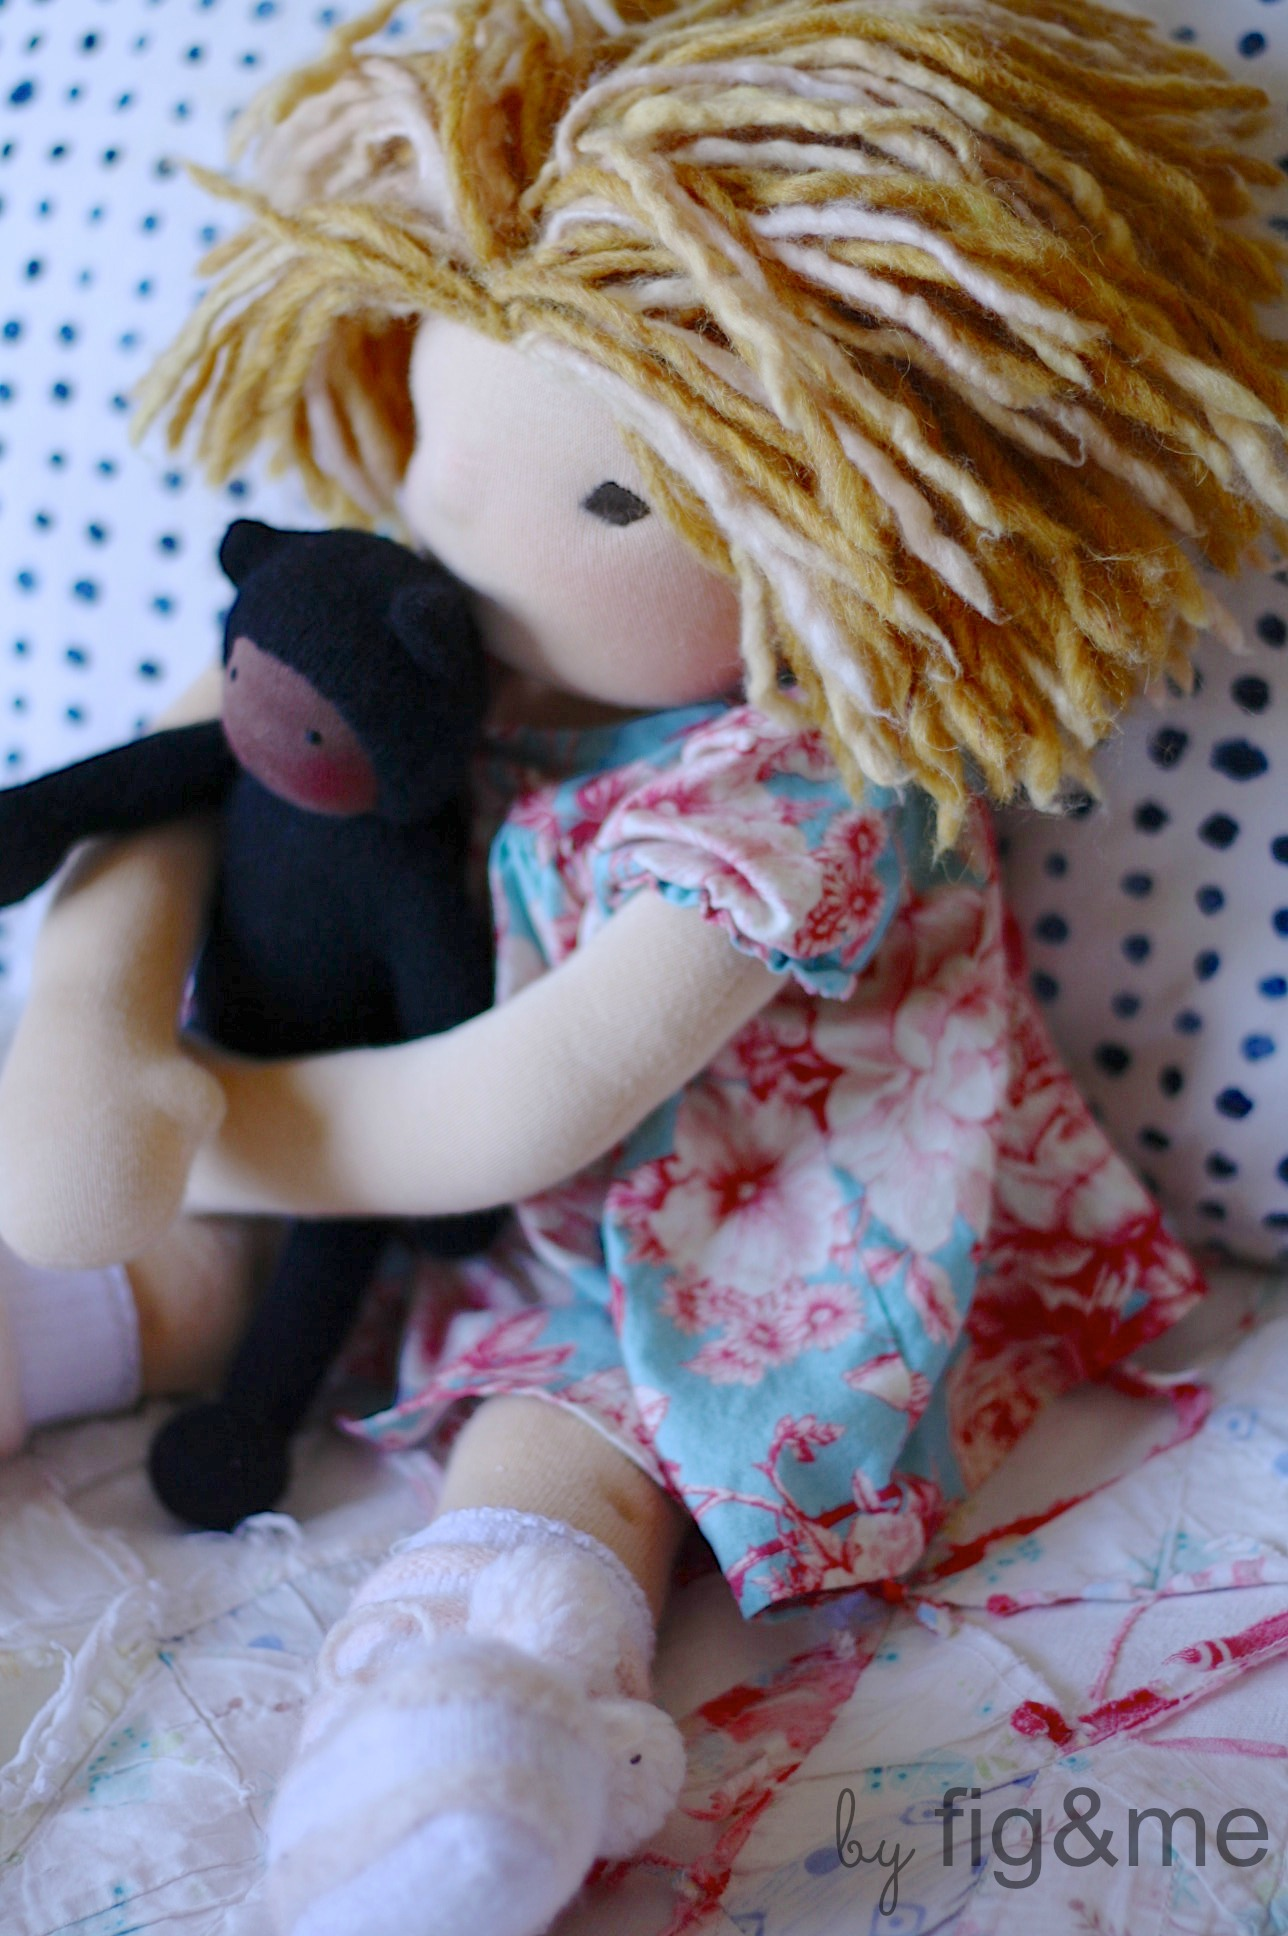 Eva-Black-Kitty-figandme.jpg